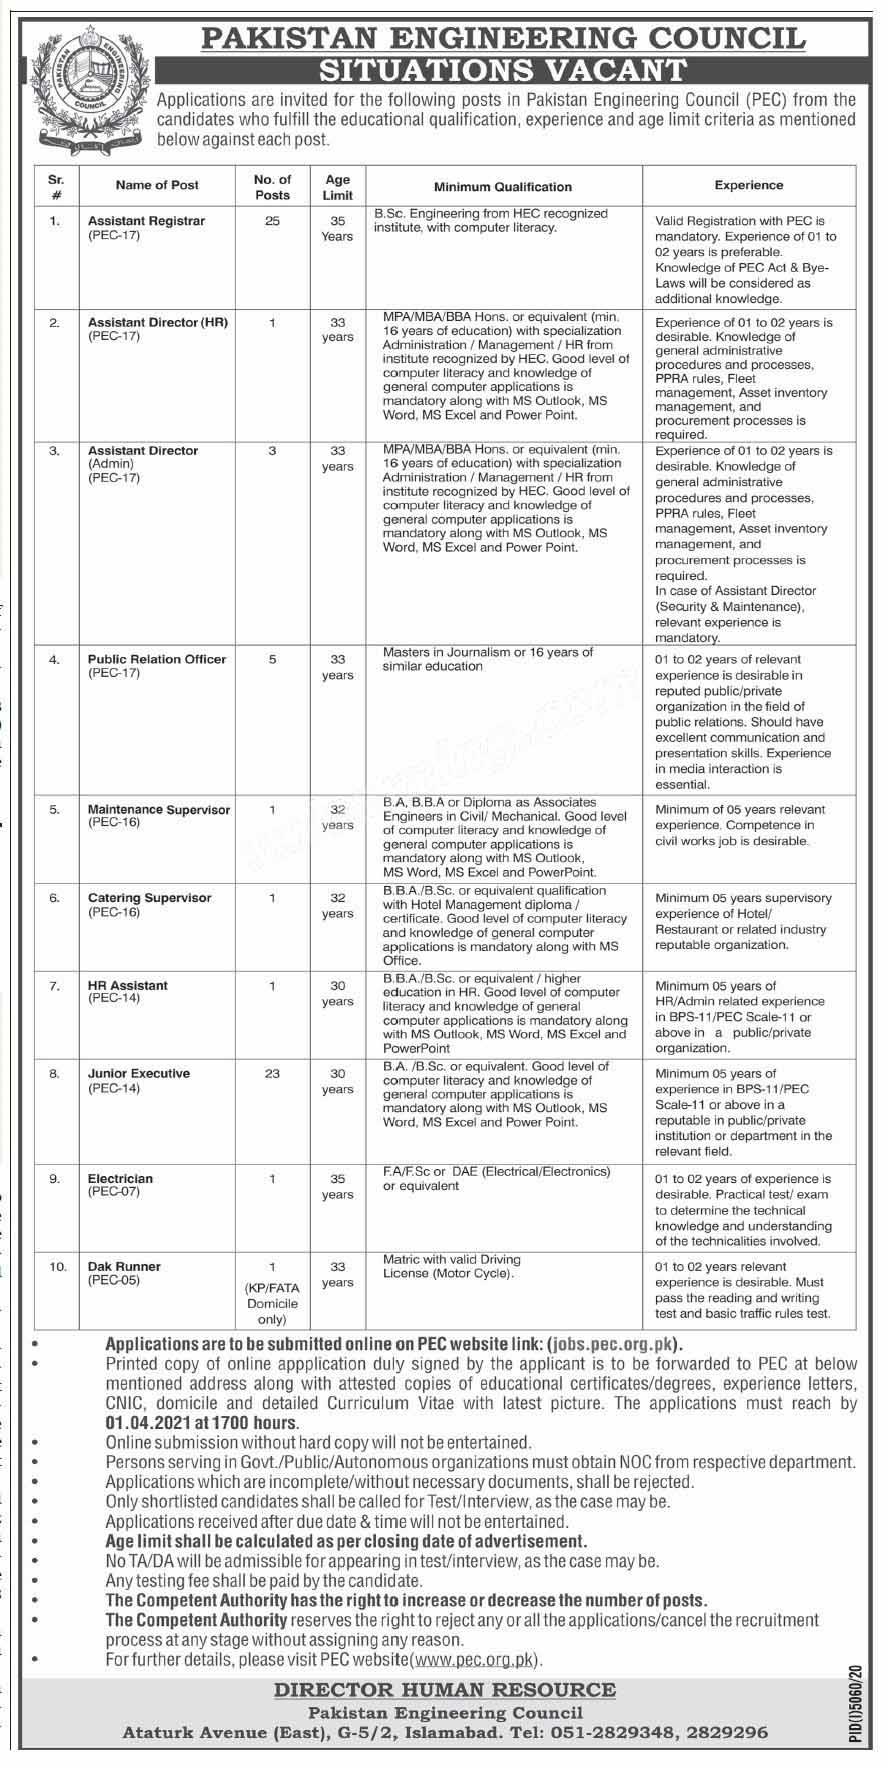 Pakistan Engineering Council Islamabad Assistant Registrar, PRO, junior executive Jobs March 2021